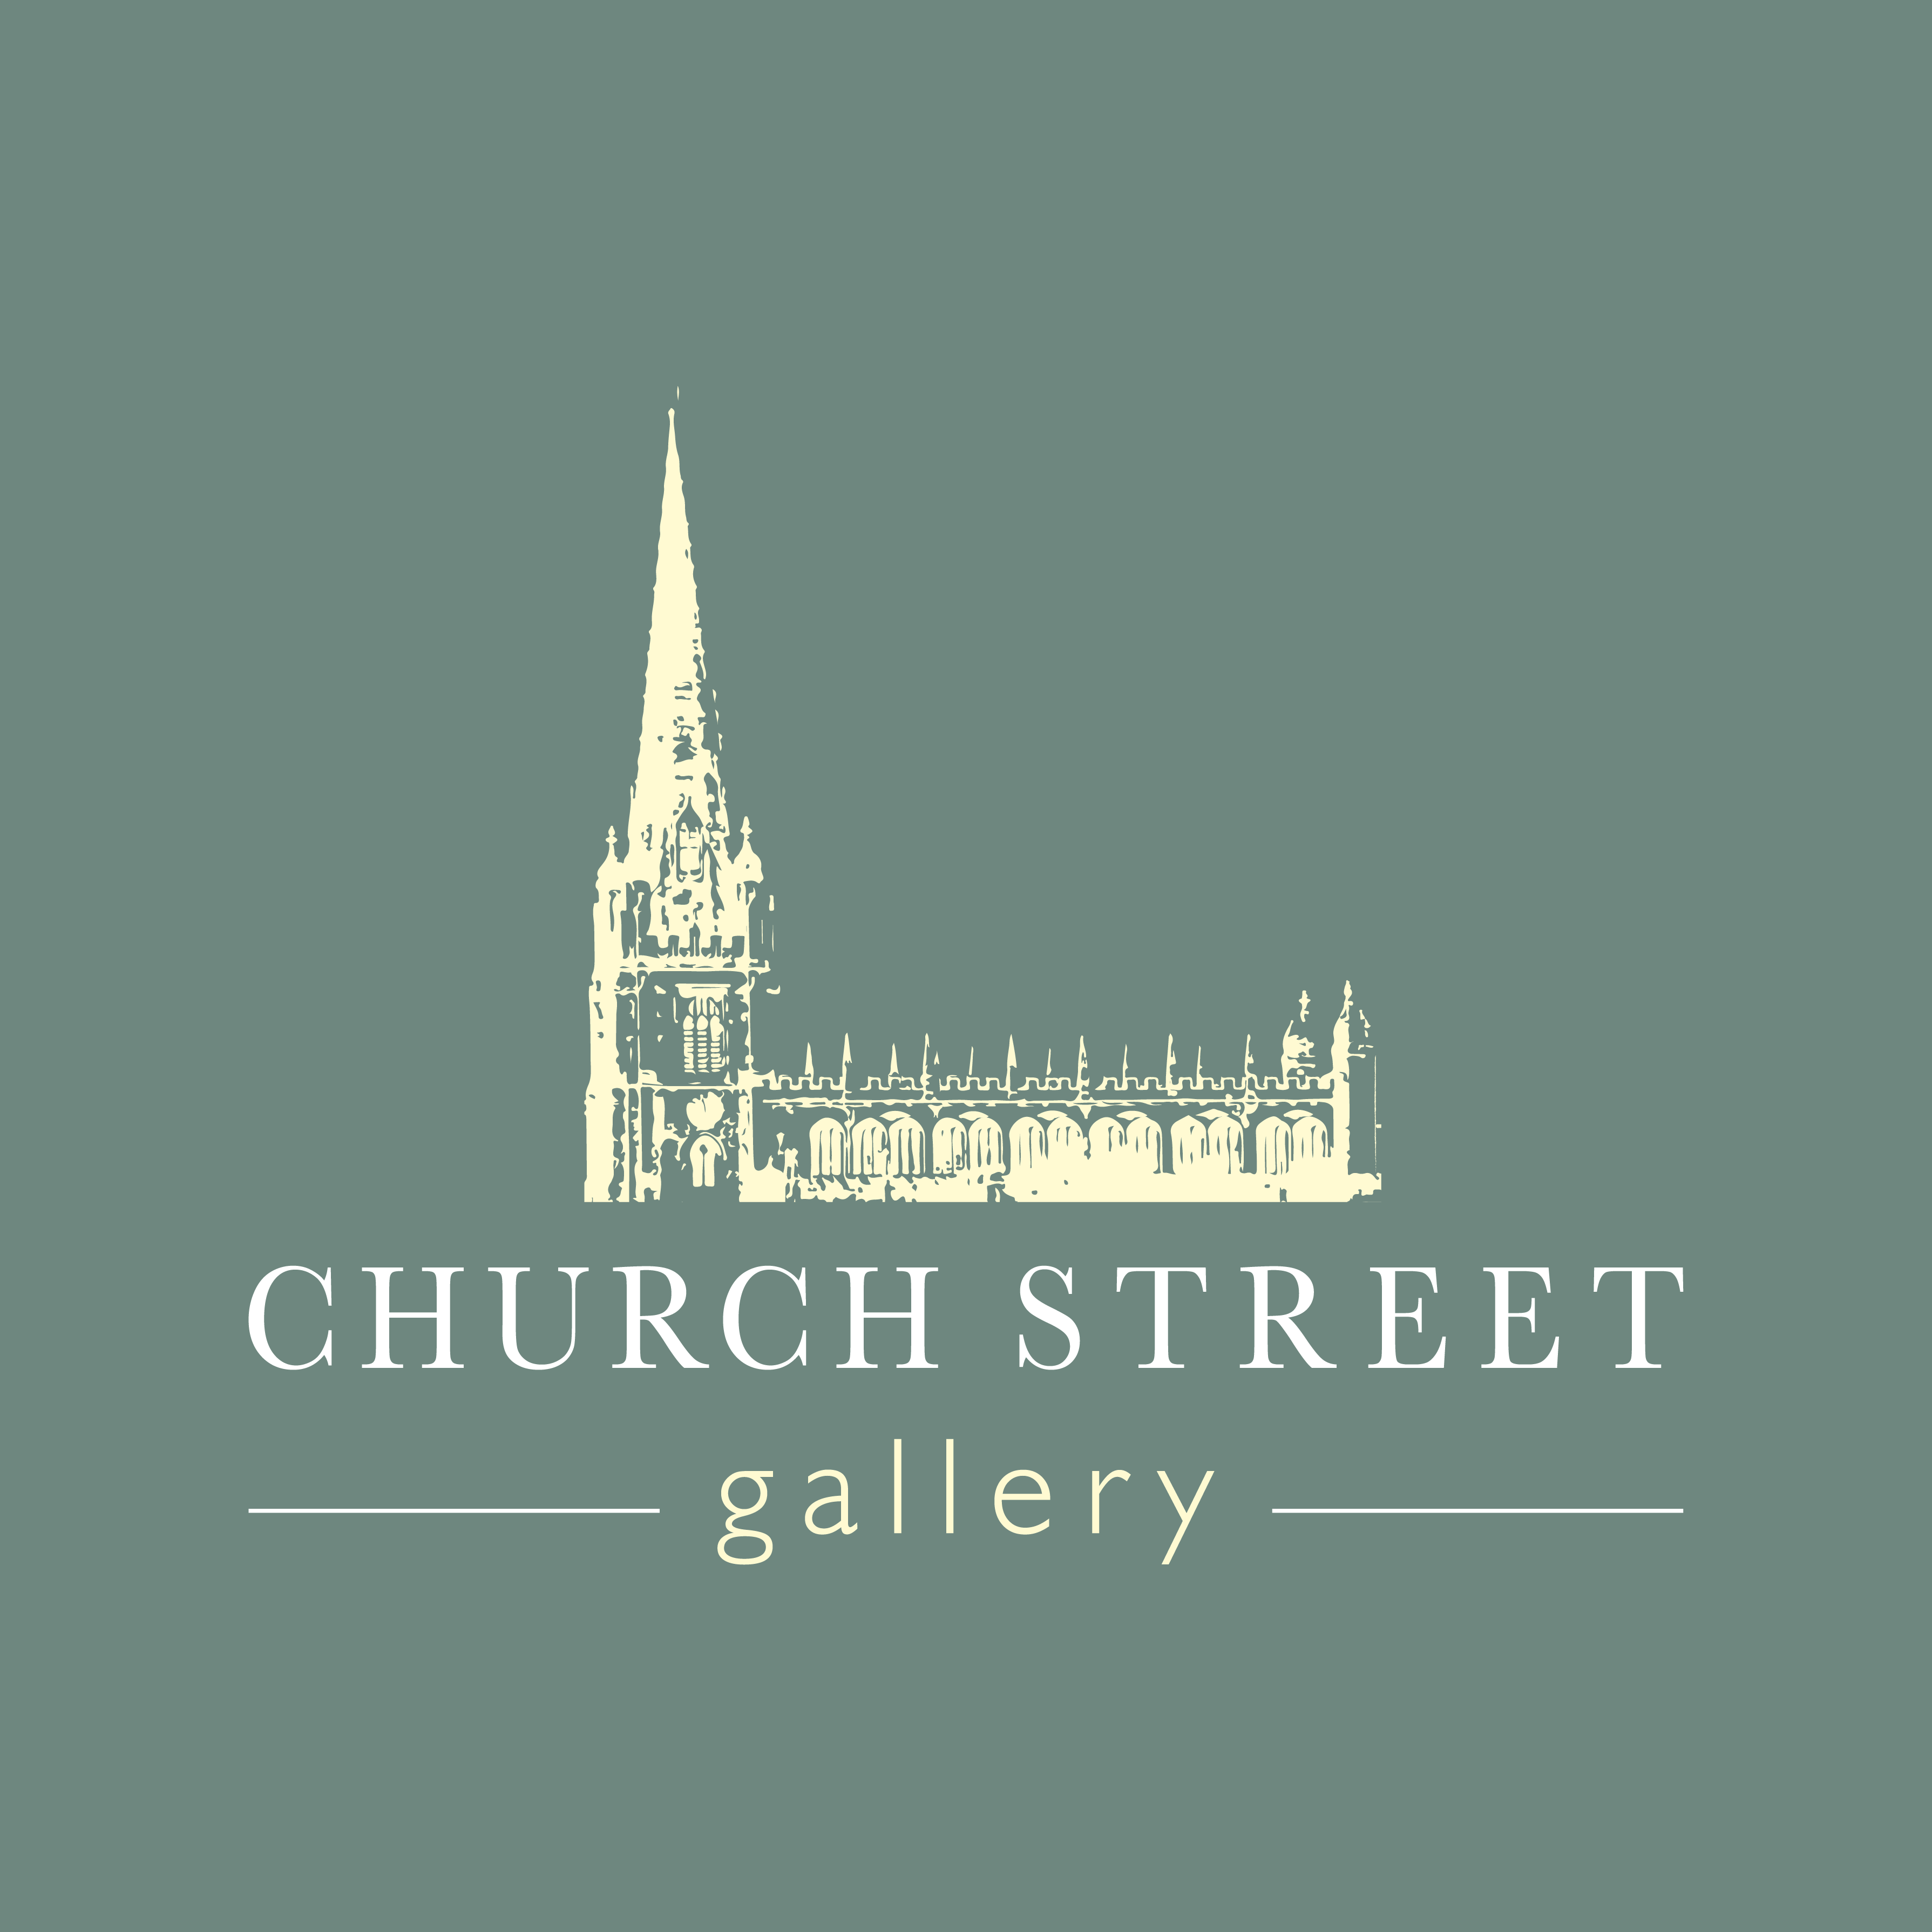 Church Street Gallery